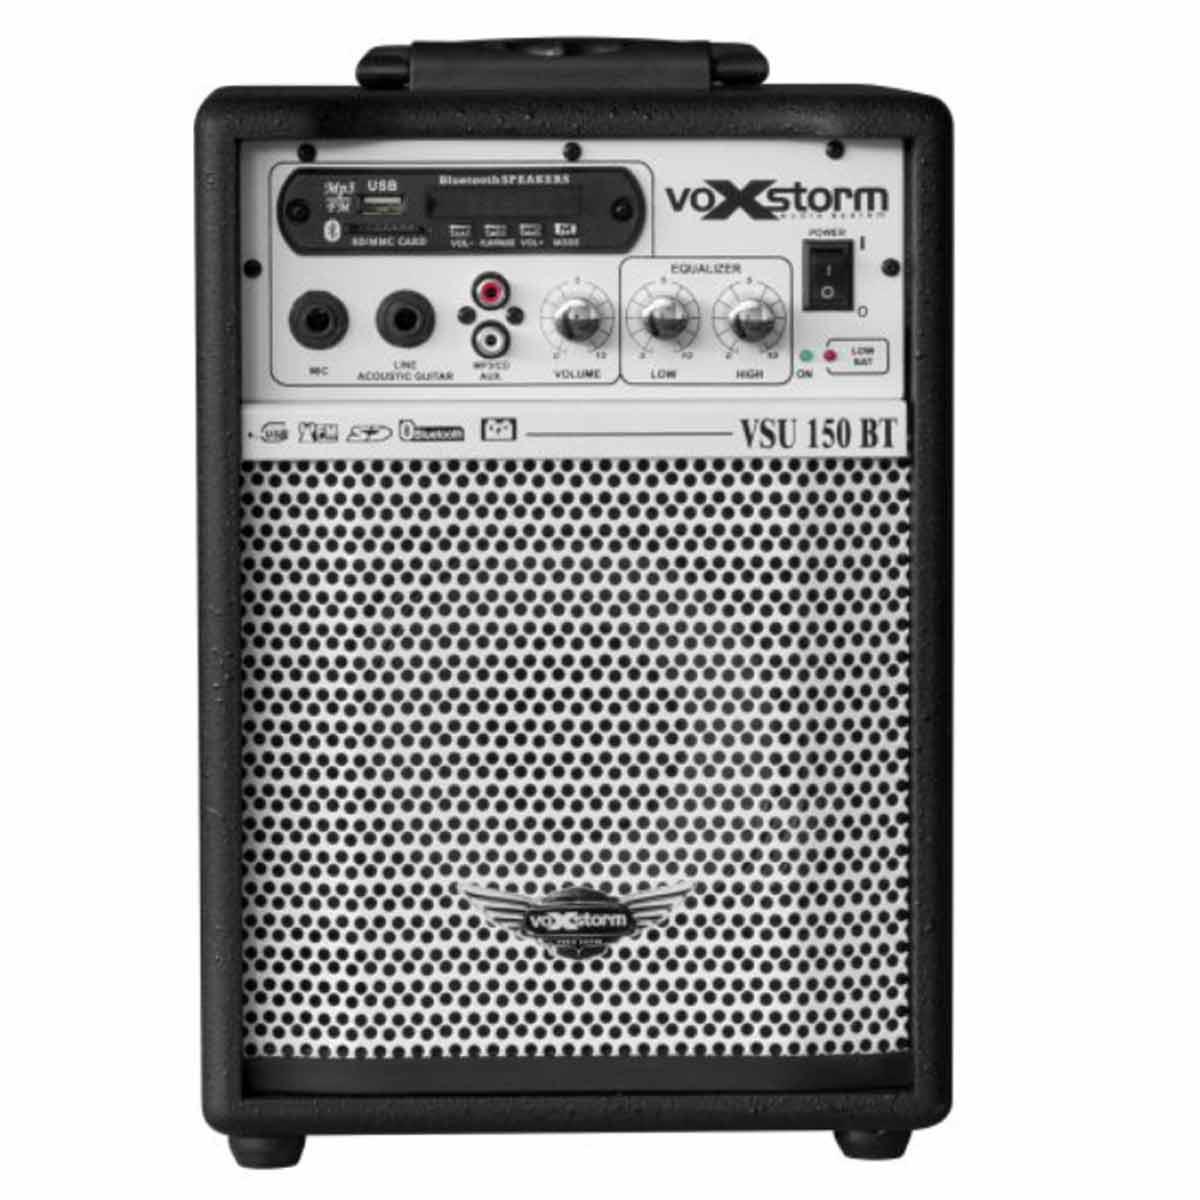 VSU150BT - Cubo Multiuso Ativo 15W c/ Bateria Interna, Bluetooth e USB VSU 150 BT Preto - Voxstorm